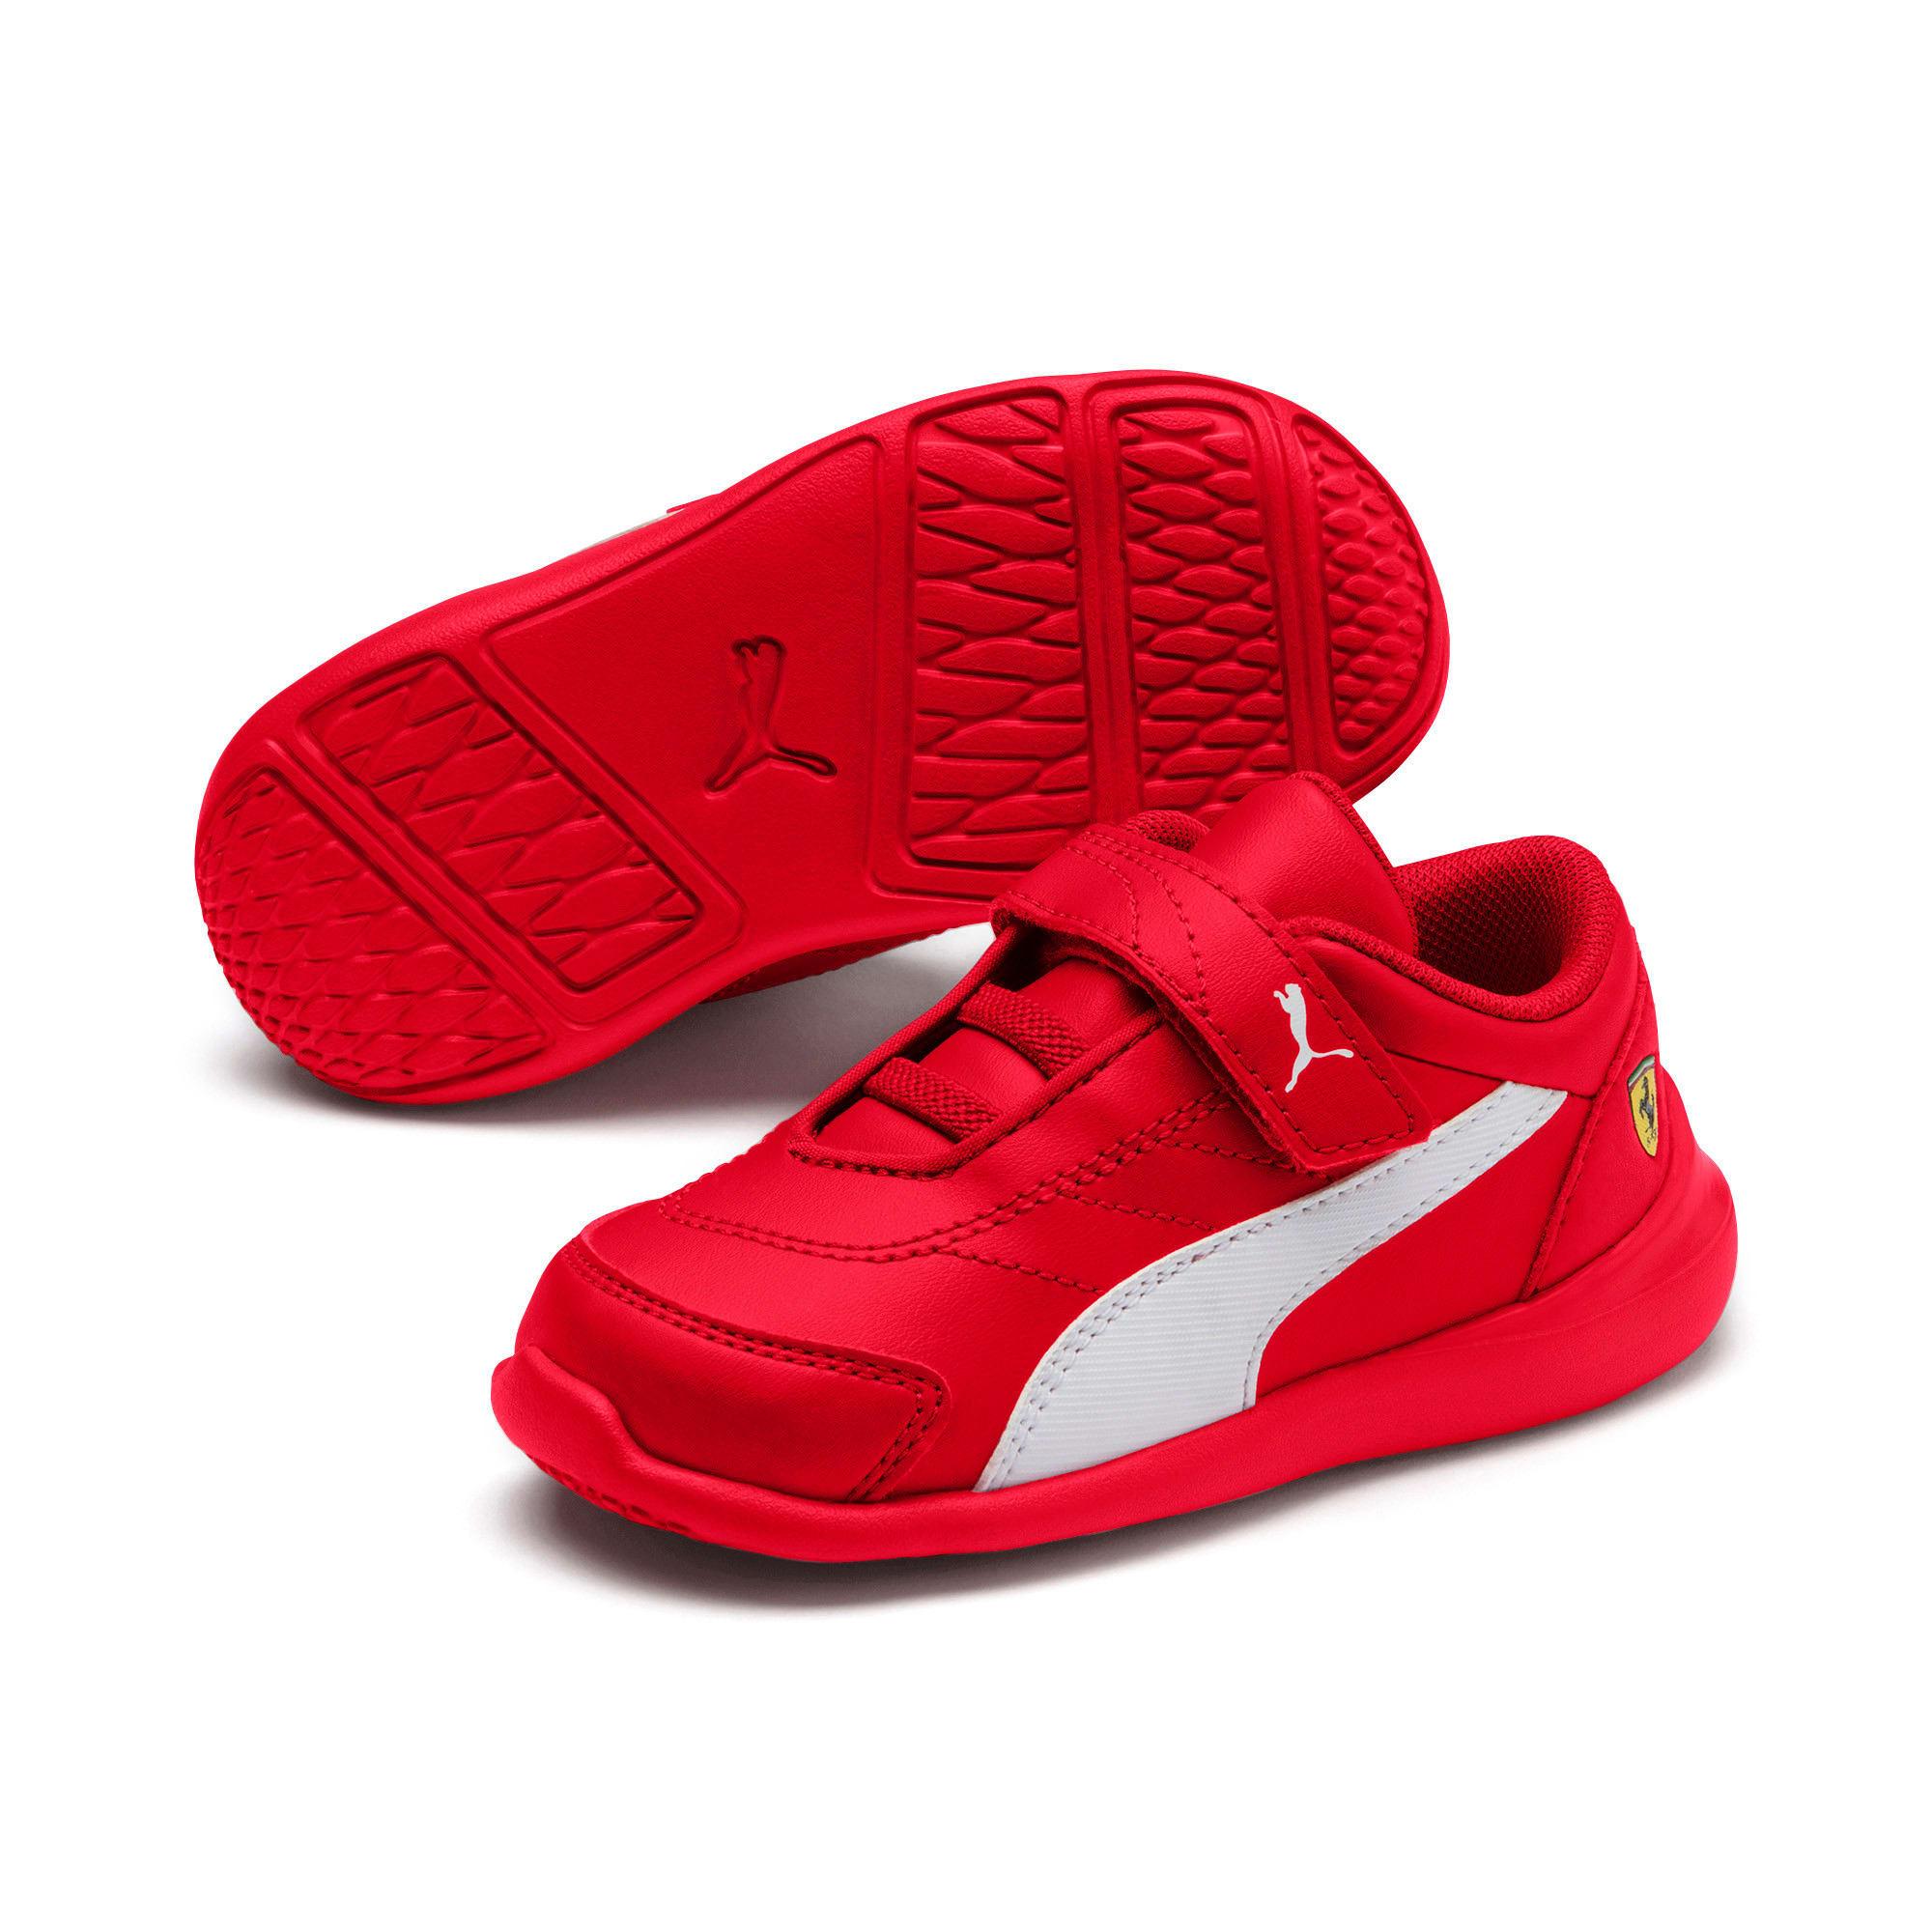 Miniatura 2 de Zapatos Scuderia Ferrari Kart Cat III para bebés, Rosso Corsa-Wht-Rosso Corsa, mediano